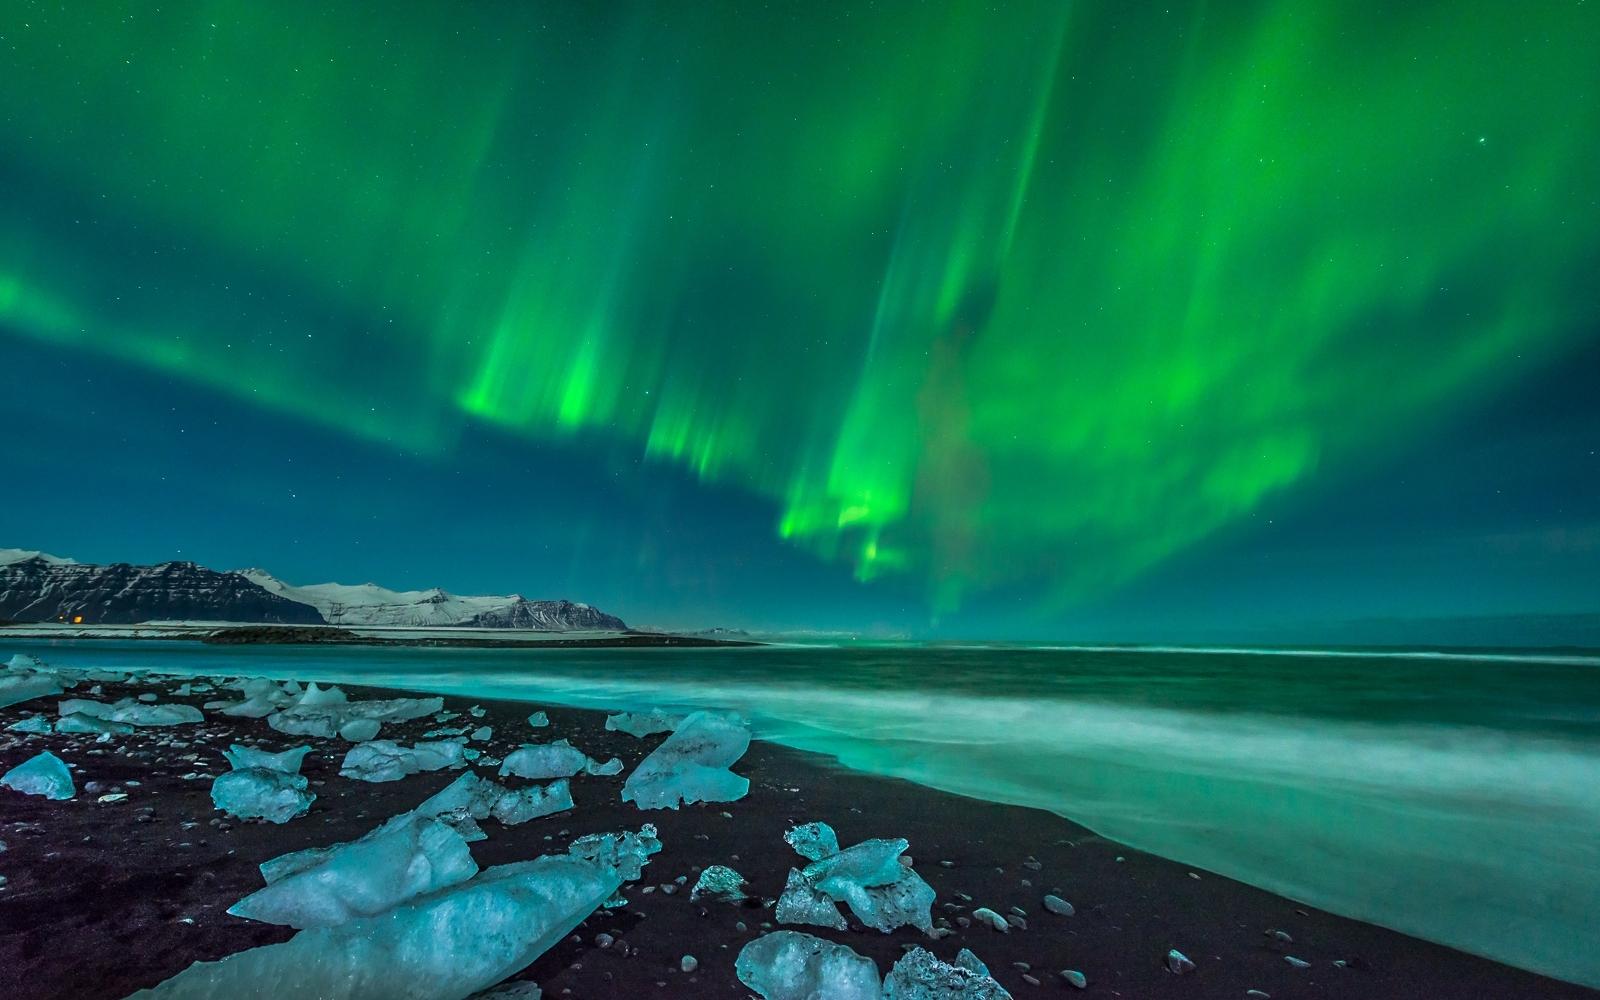 aurora borealis wallpaper and background image | 1600x1000 | id:416975